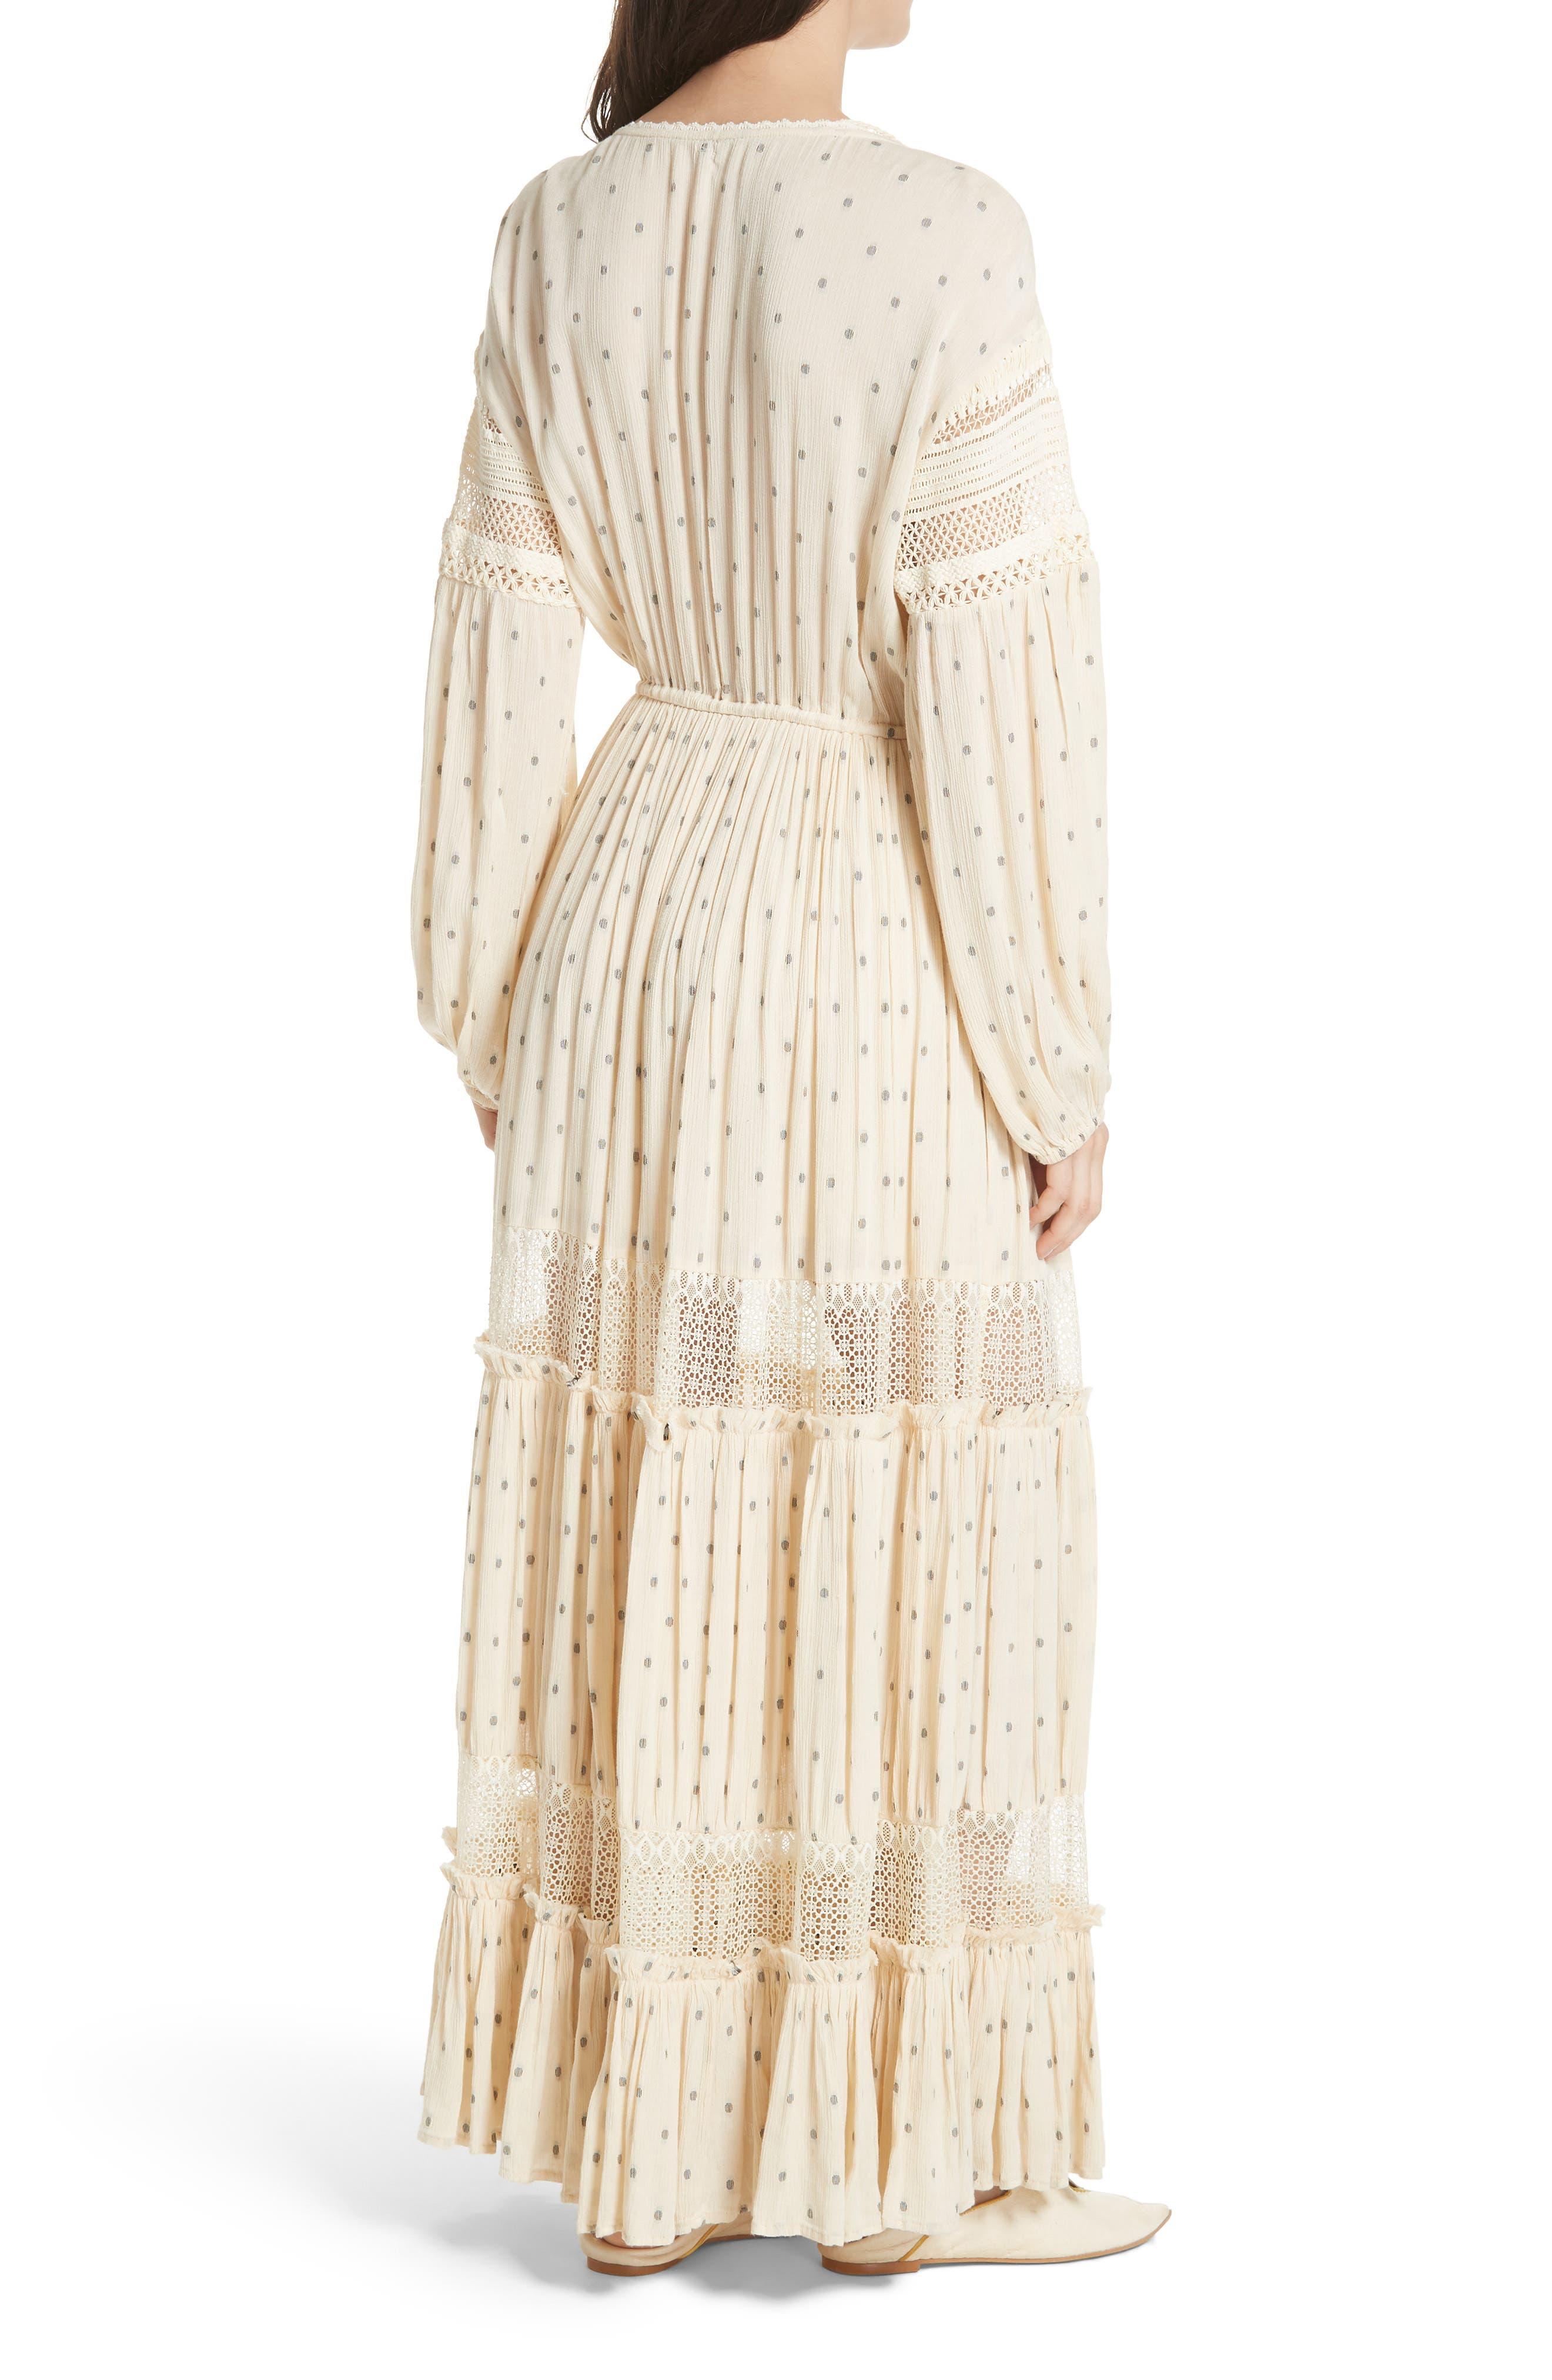 Sada Maxi Dress,                             Alternate thumbnail 2, color,                             903